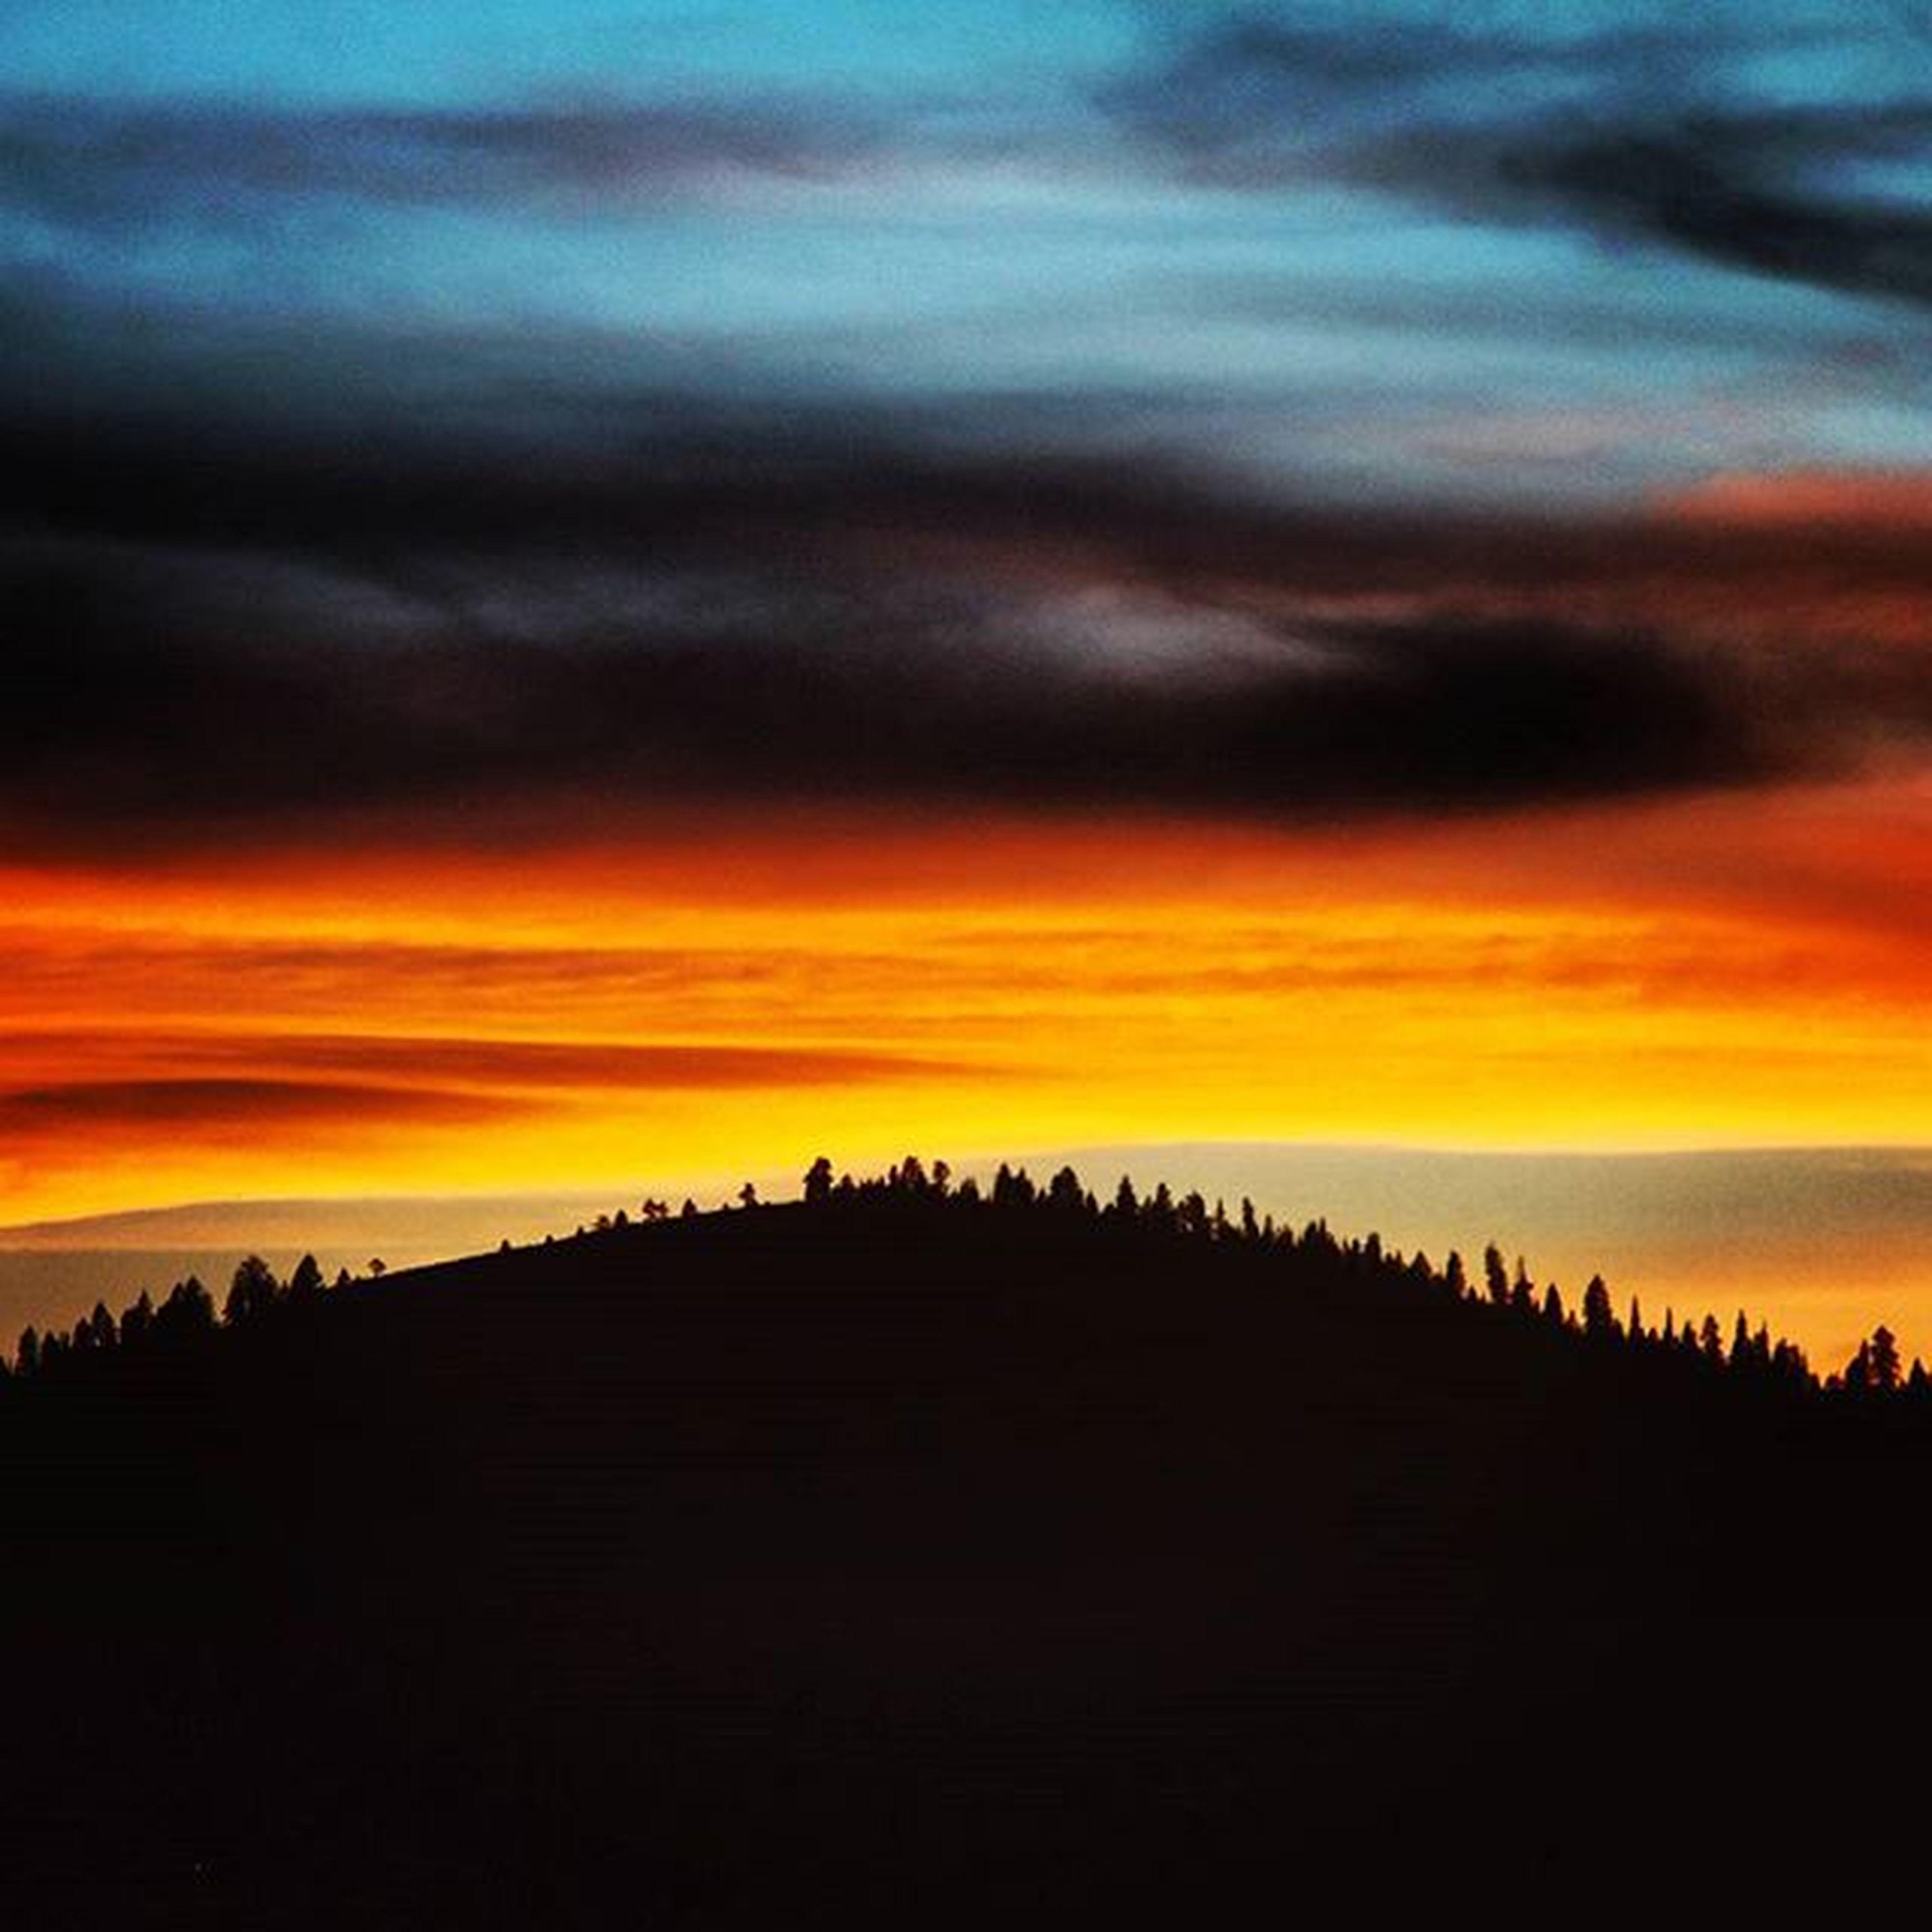 sunset, silhouette, orange color, scenics, sky, tranquil scene, tranquility, beauty in nature, nature, cloud - sky, idyllic, dramatic sky, landscape, dusk, cloud, outdoors, majestic, dark, no people, moody sky